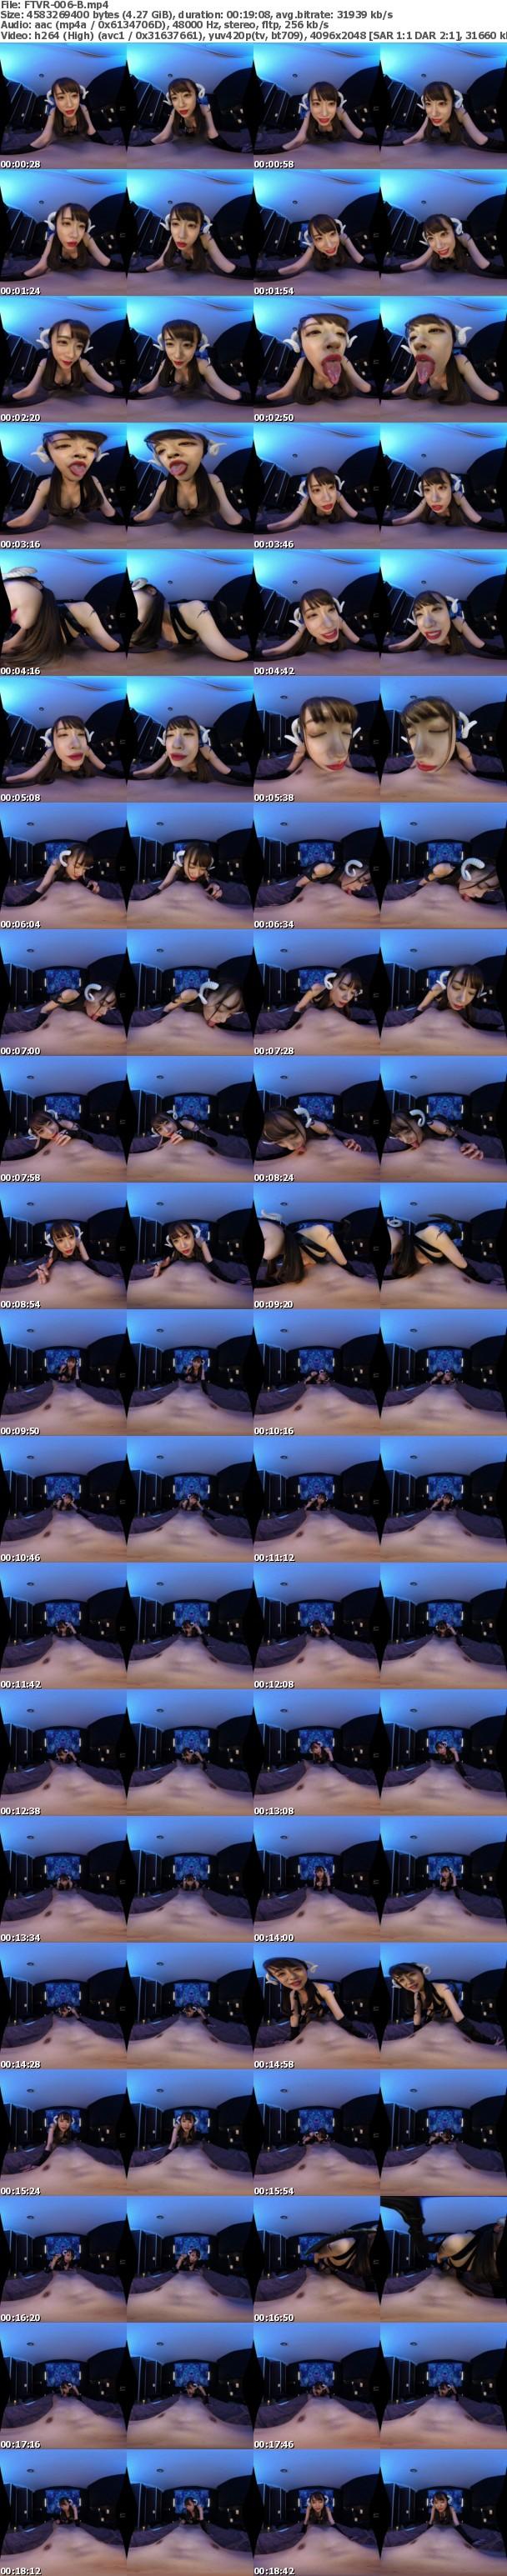 (VR) FTVR-006 リピーター続出!!サキュバスが降臨する近所で評判の穴場エステの金玉が空になる拘束無限発射サービス プレイタイム110分5発射! 桐山結羽